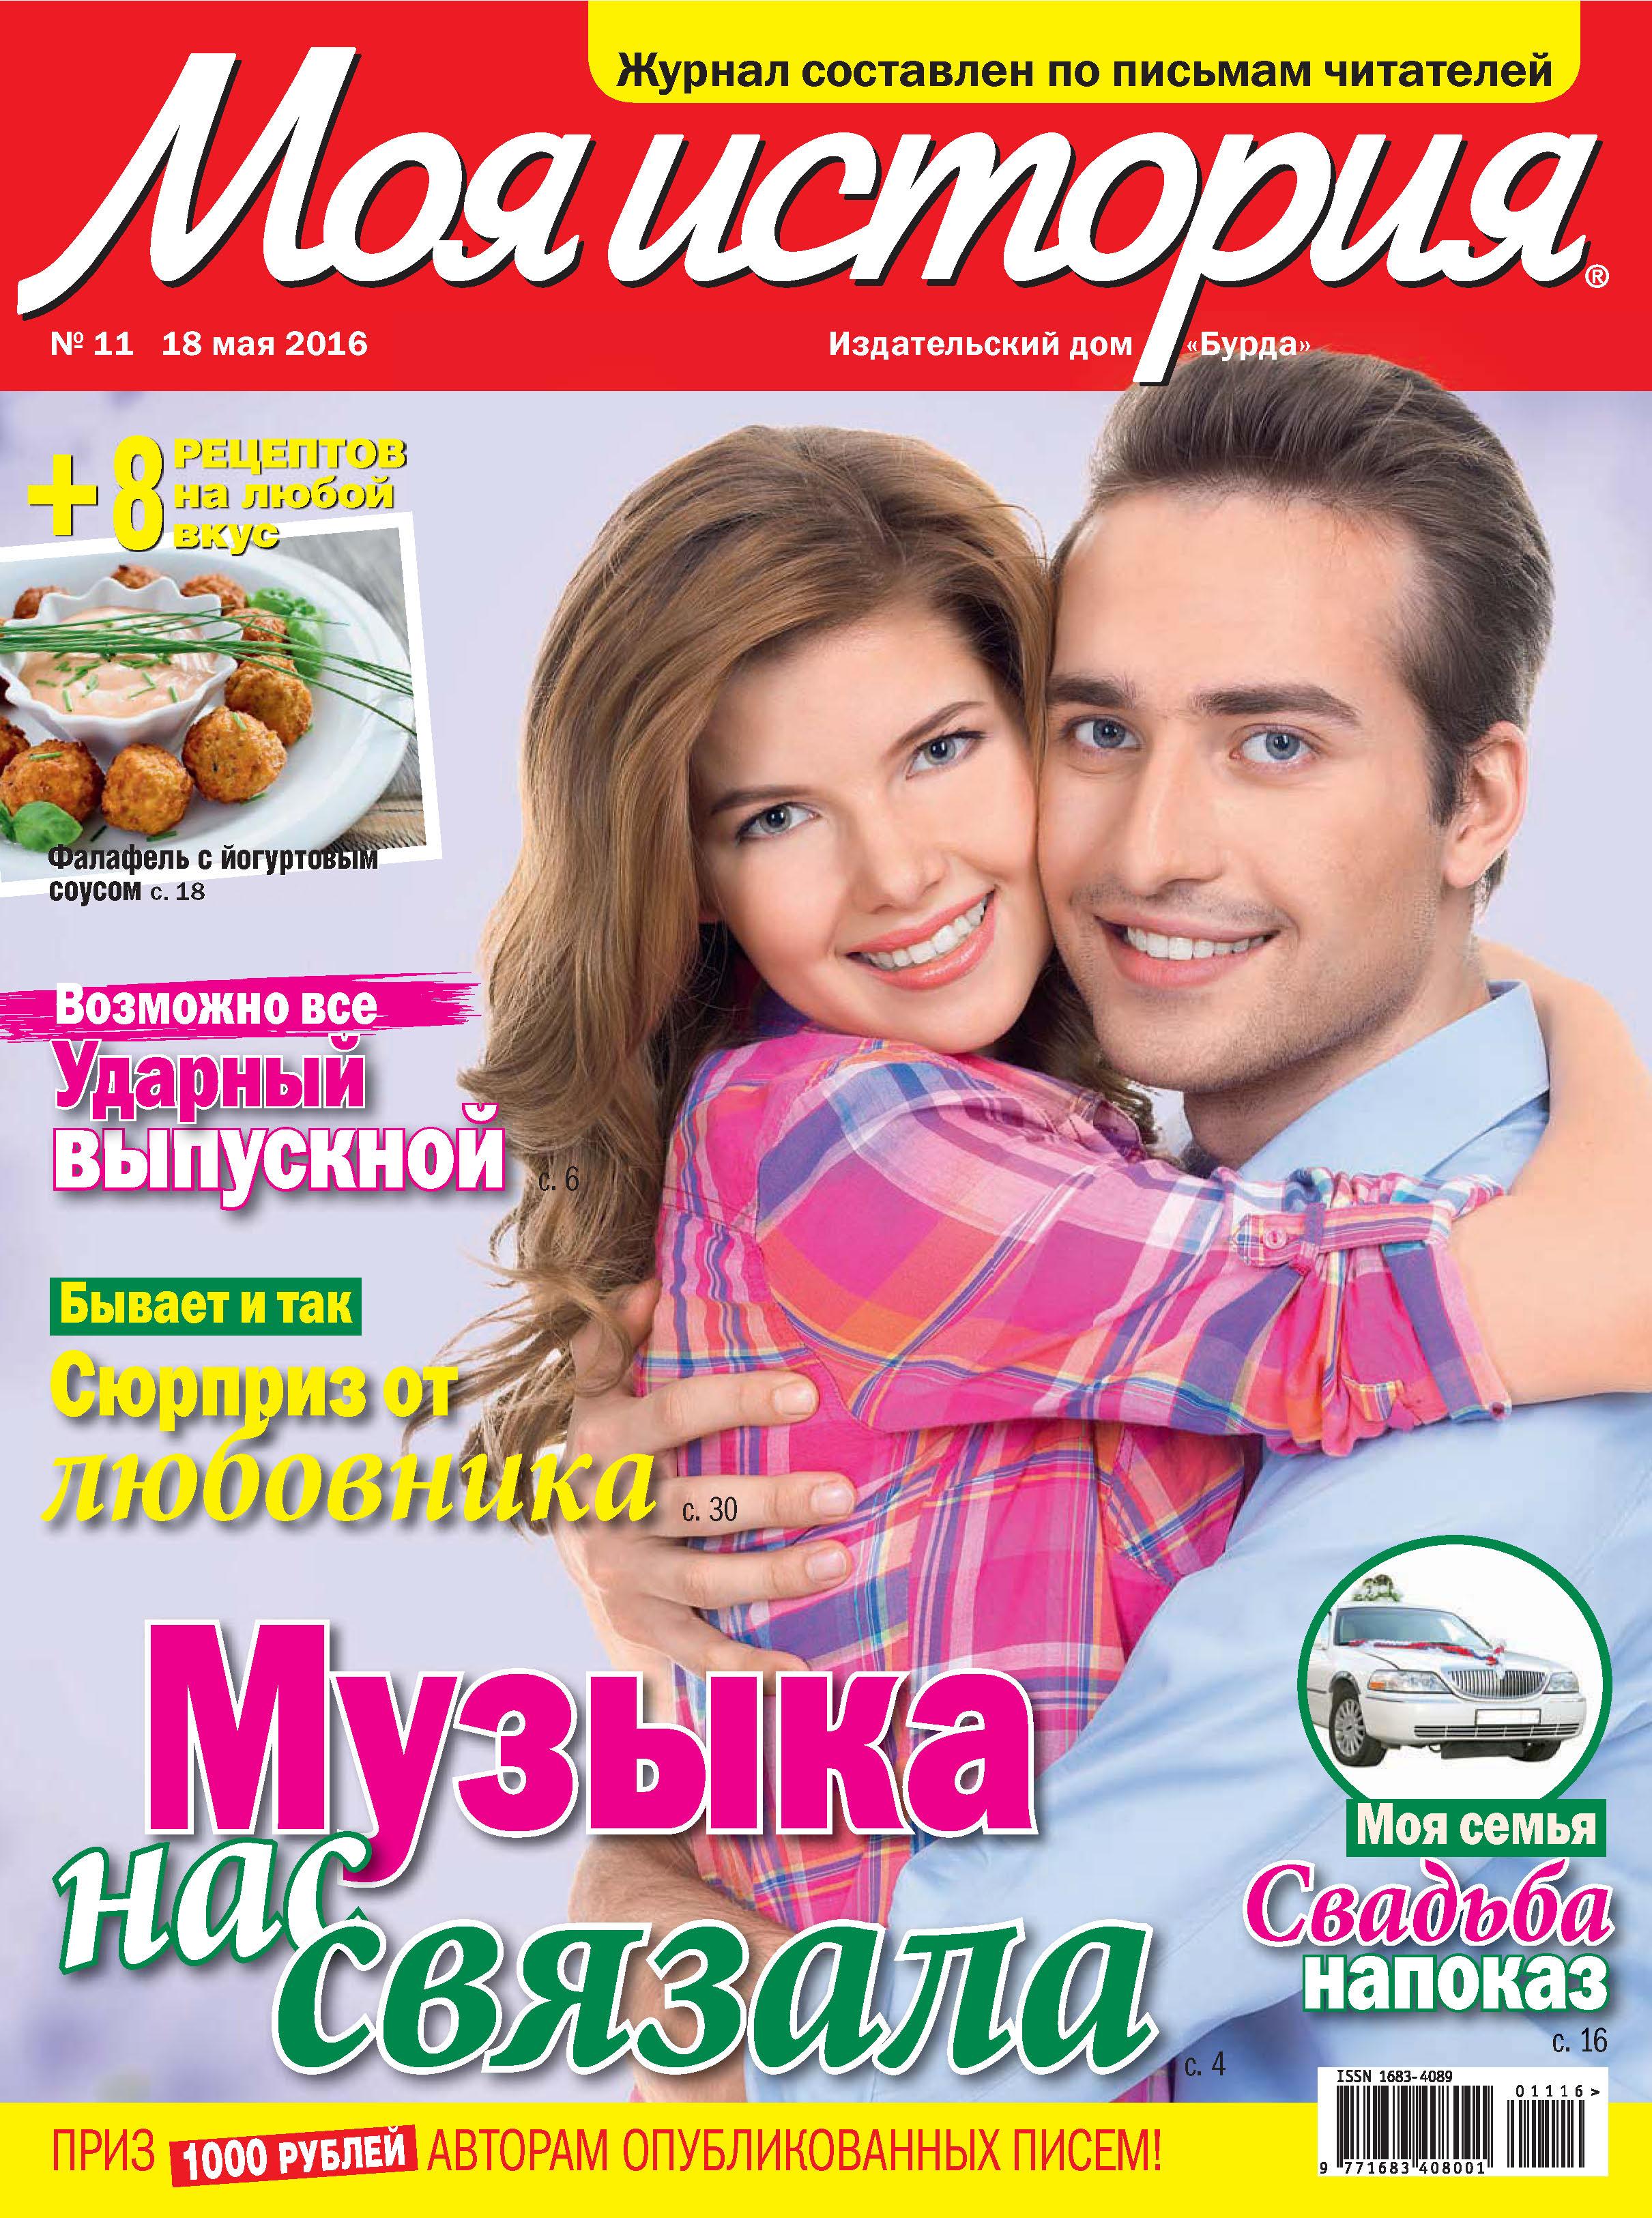 ИД «Бурда» Журнал «Моя история» №11/2016 ид бурда журнал моя история 24 2016